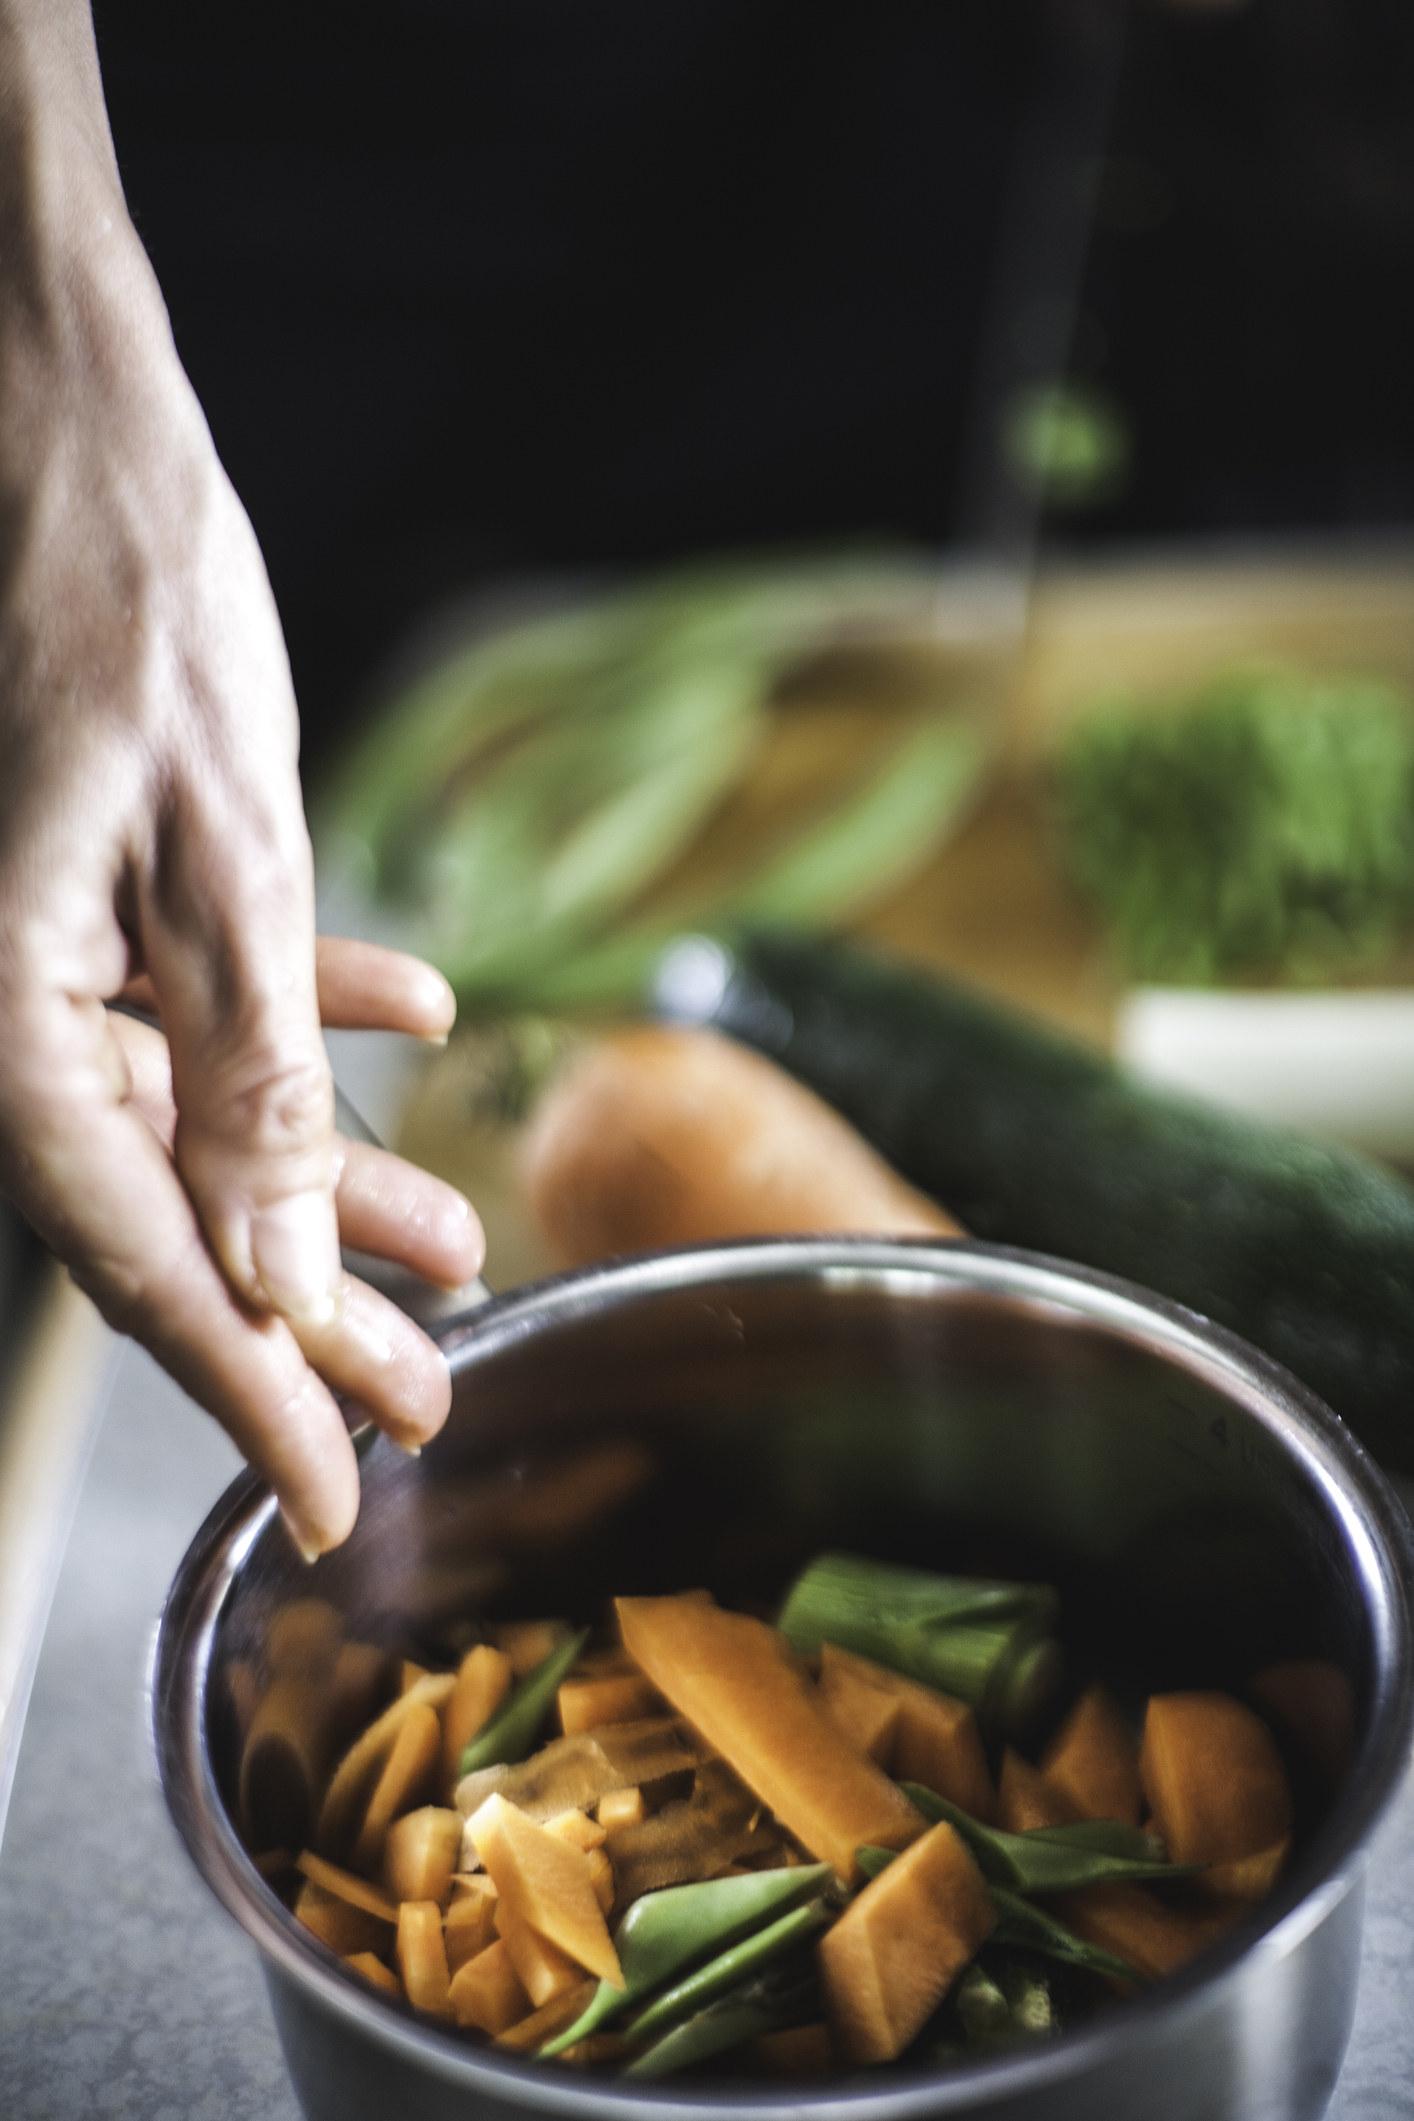 Adding veggie scraps to a pot for stock